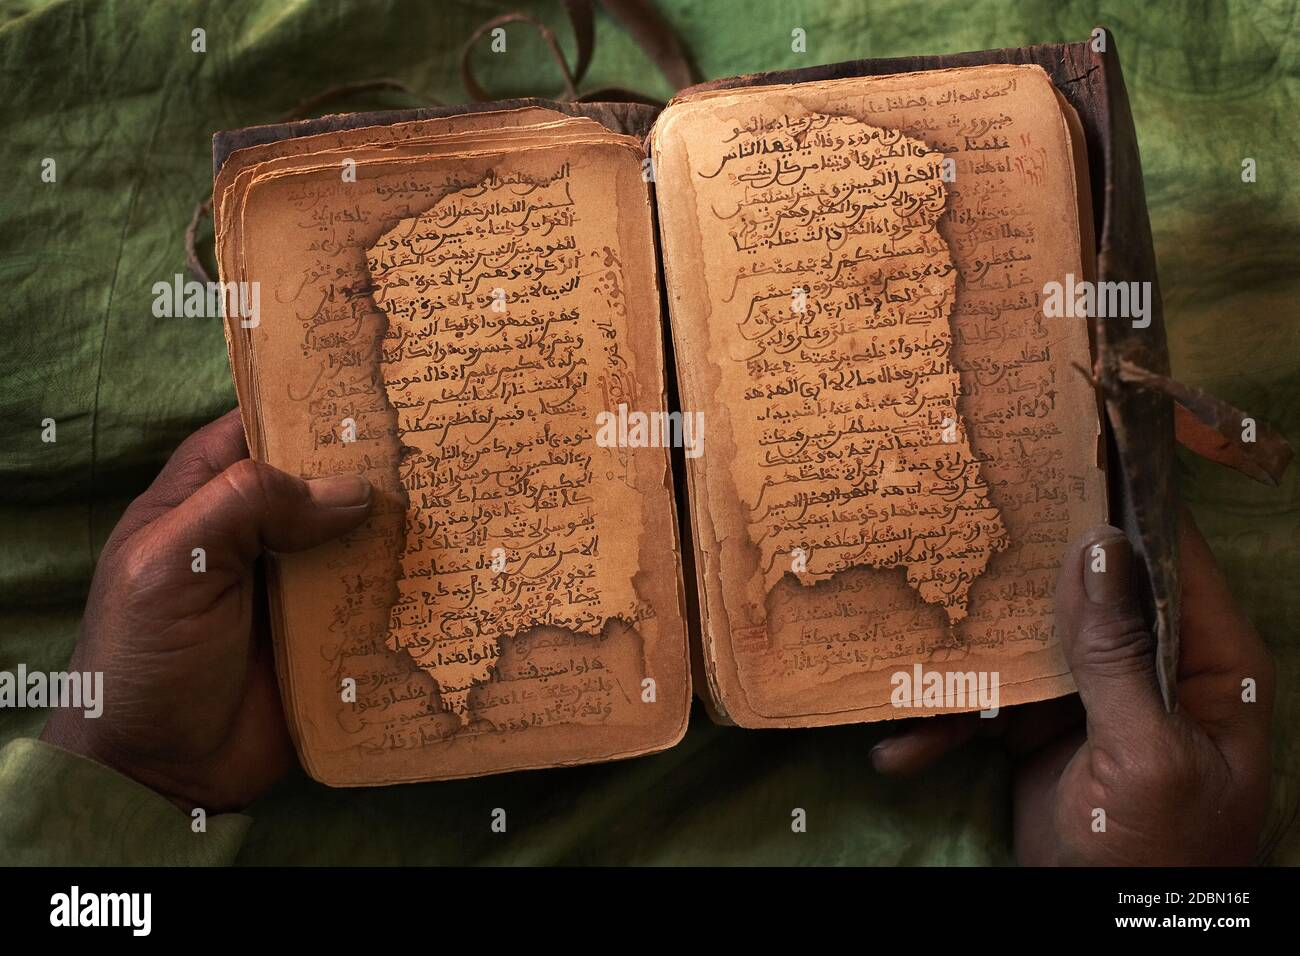 Bularaf holding a Islamic Medical Manuscript  from 16th century. Stock Photo